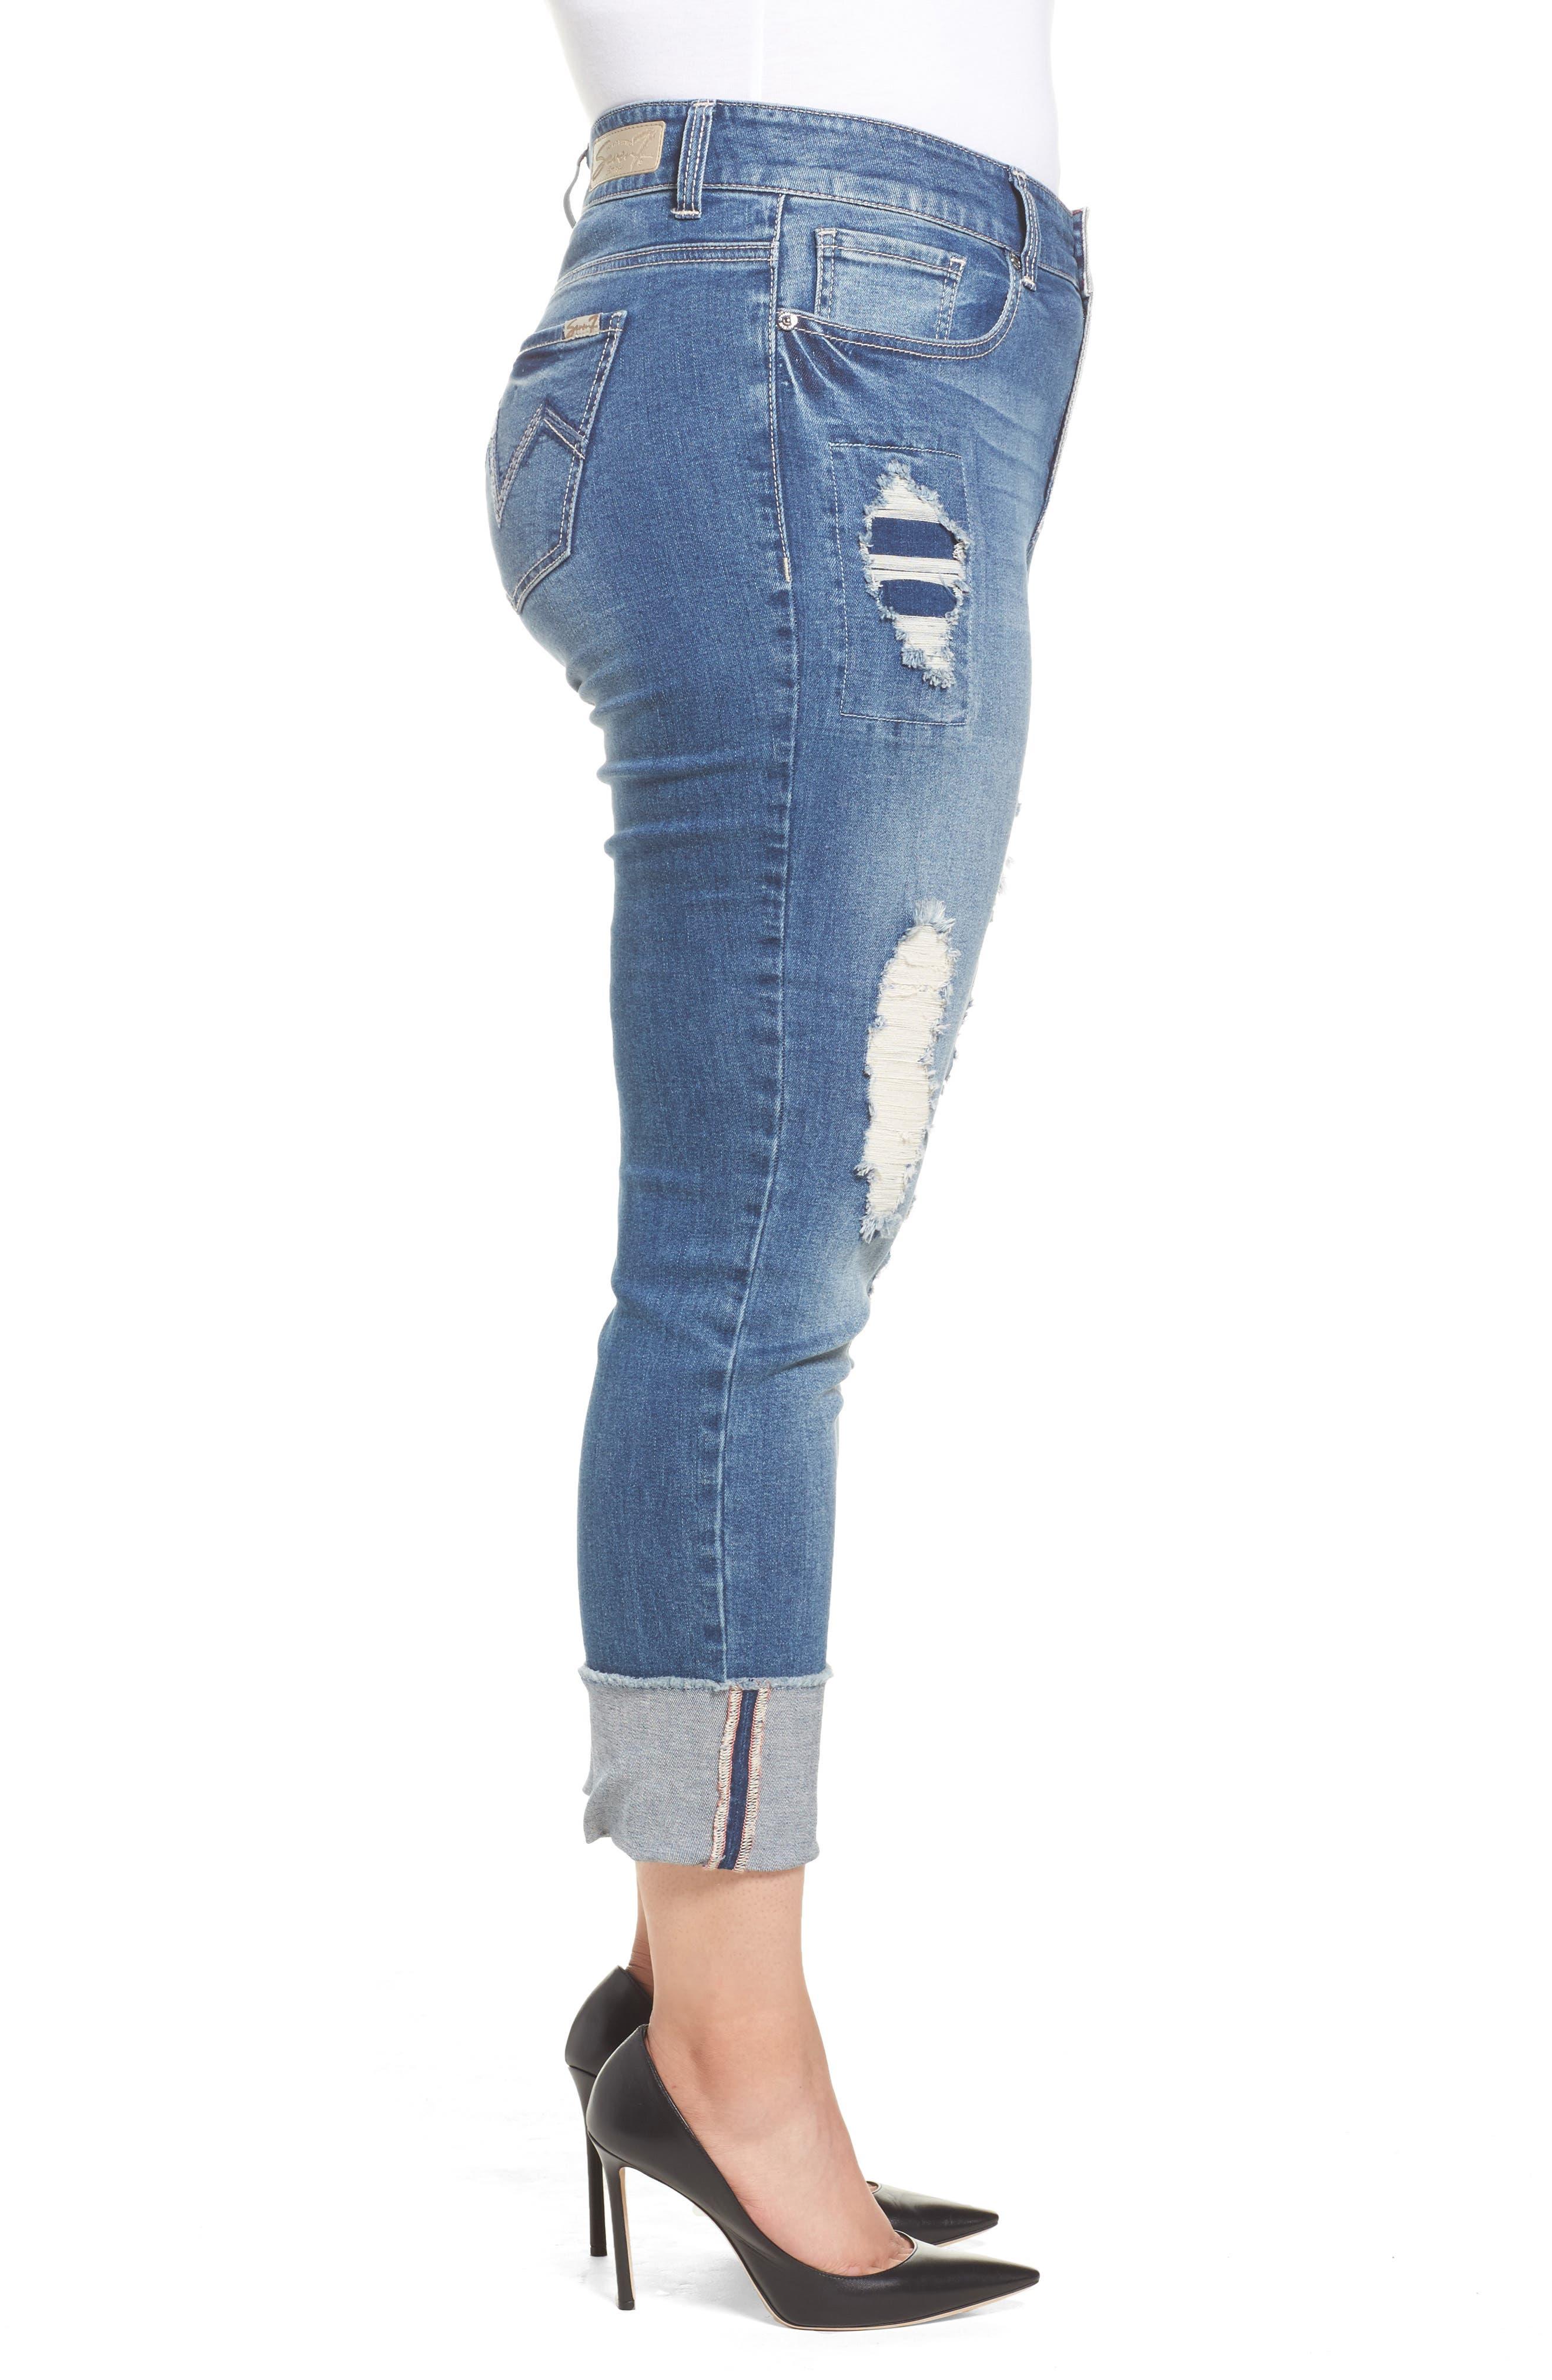 Alternate Image 3  - Seven7 Distressed Slim Raw Hem Cuffed Jeans (Concorde) (Plus Size)